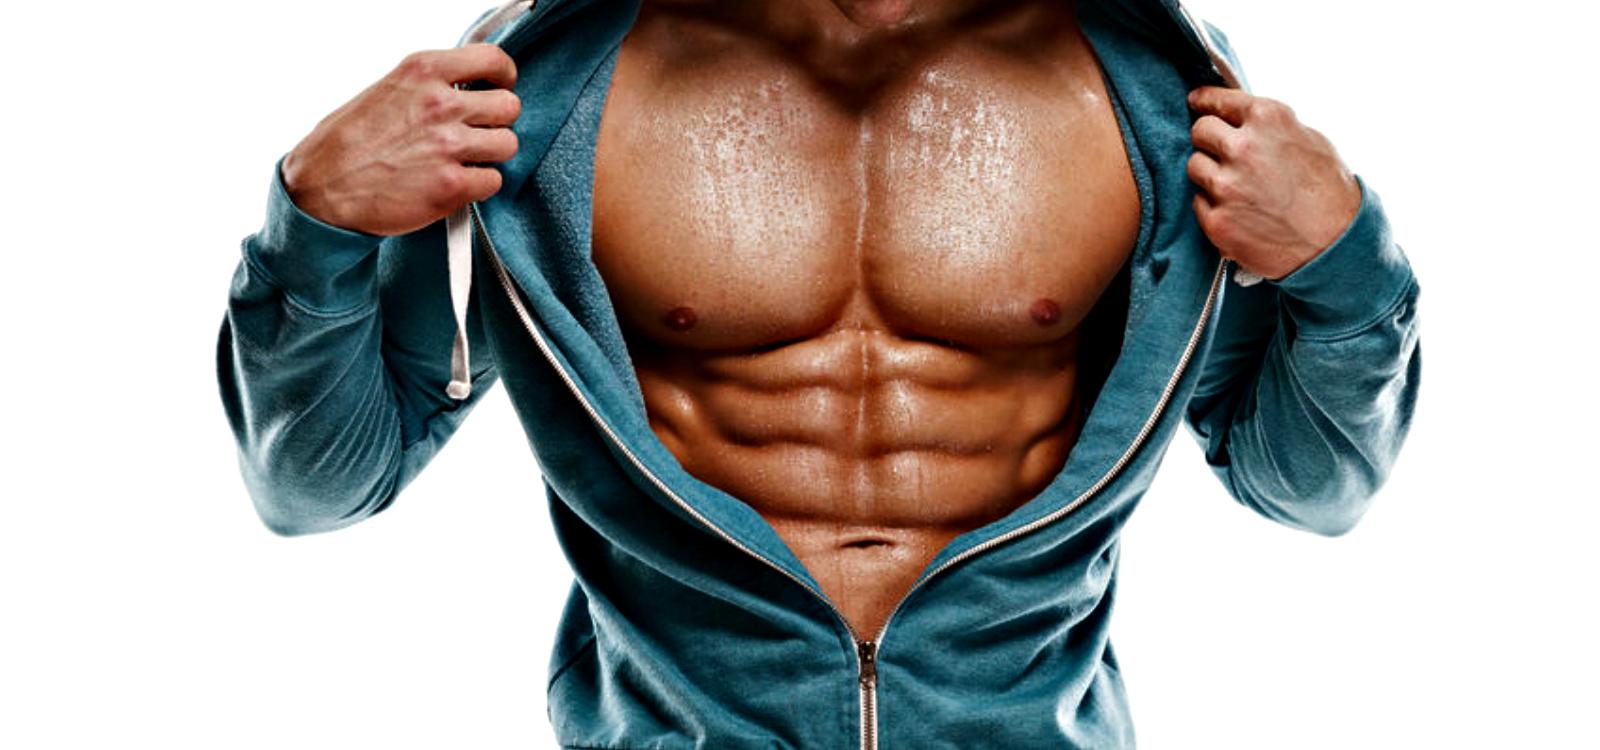 building a workout